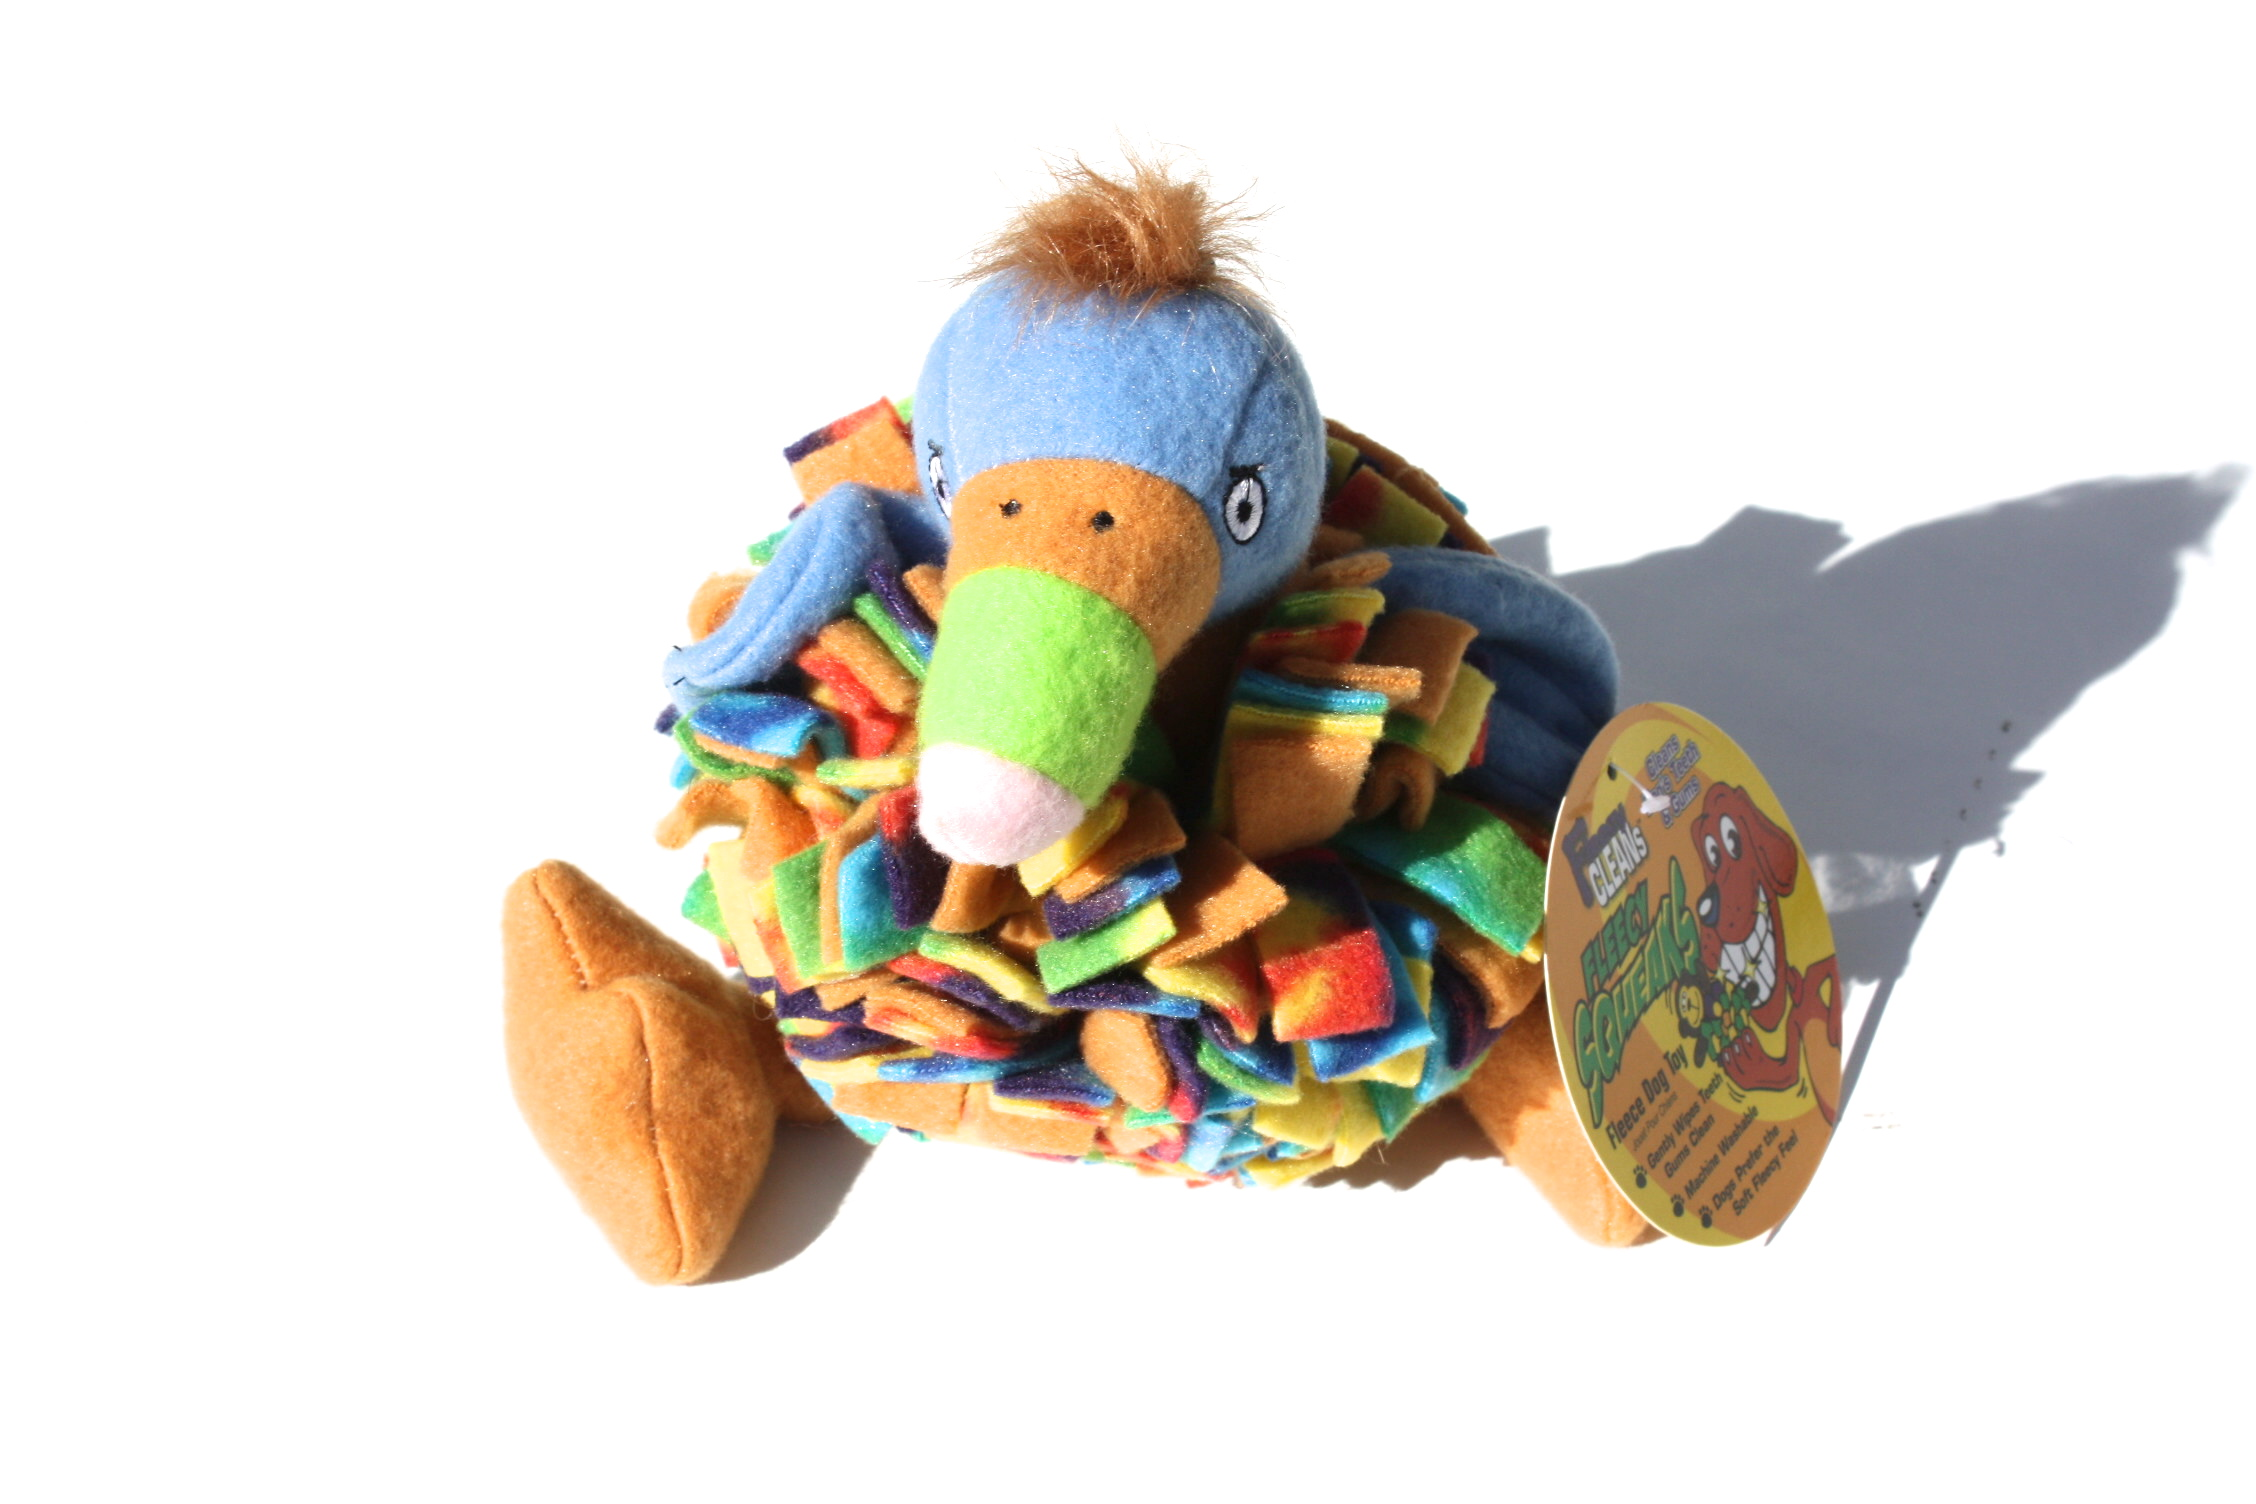 Fleecy Squeaks Dog Toy Toucan フリーシー スクイーカー ドッグトーイ  トゥーカン_d0217958_19123763.jpg